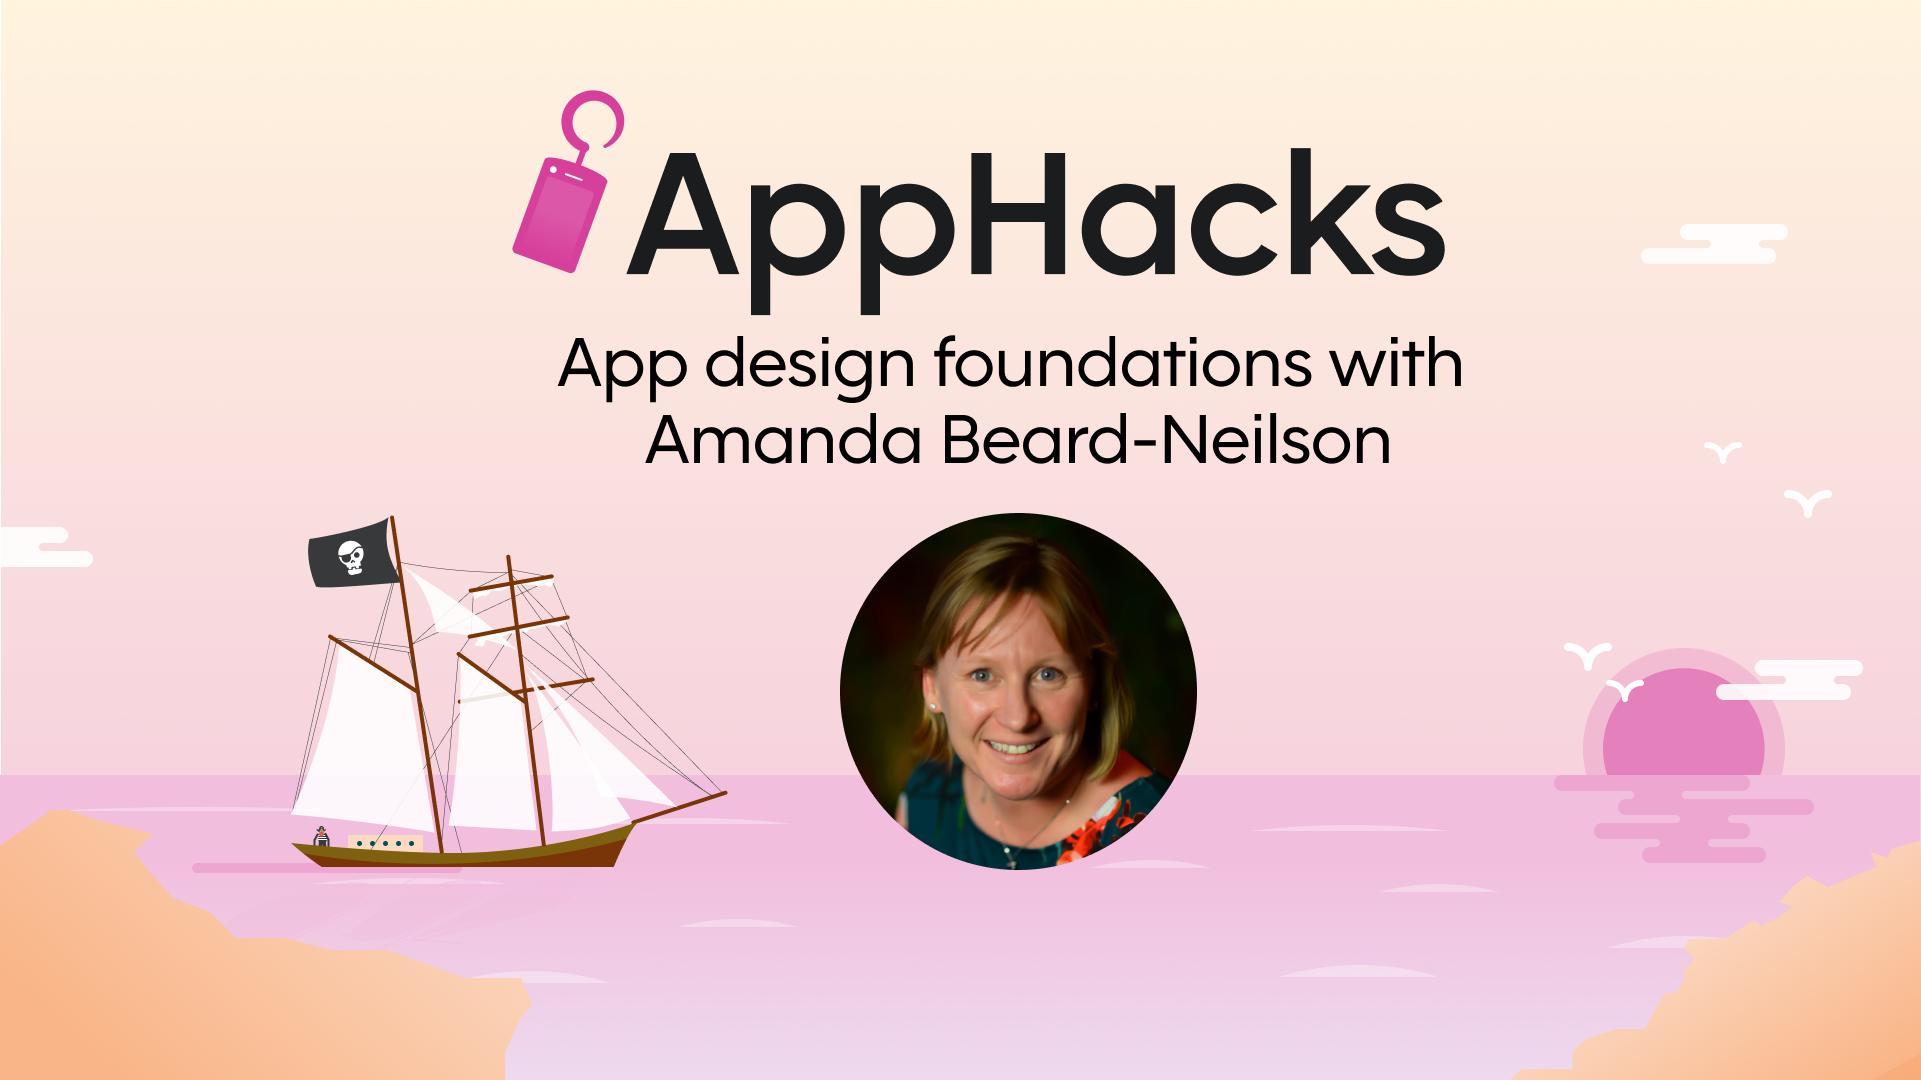 App design foundations with Amanda Beard-Neilson | Skuid AppHacks